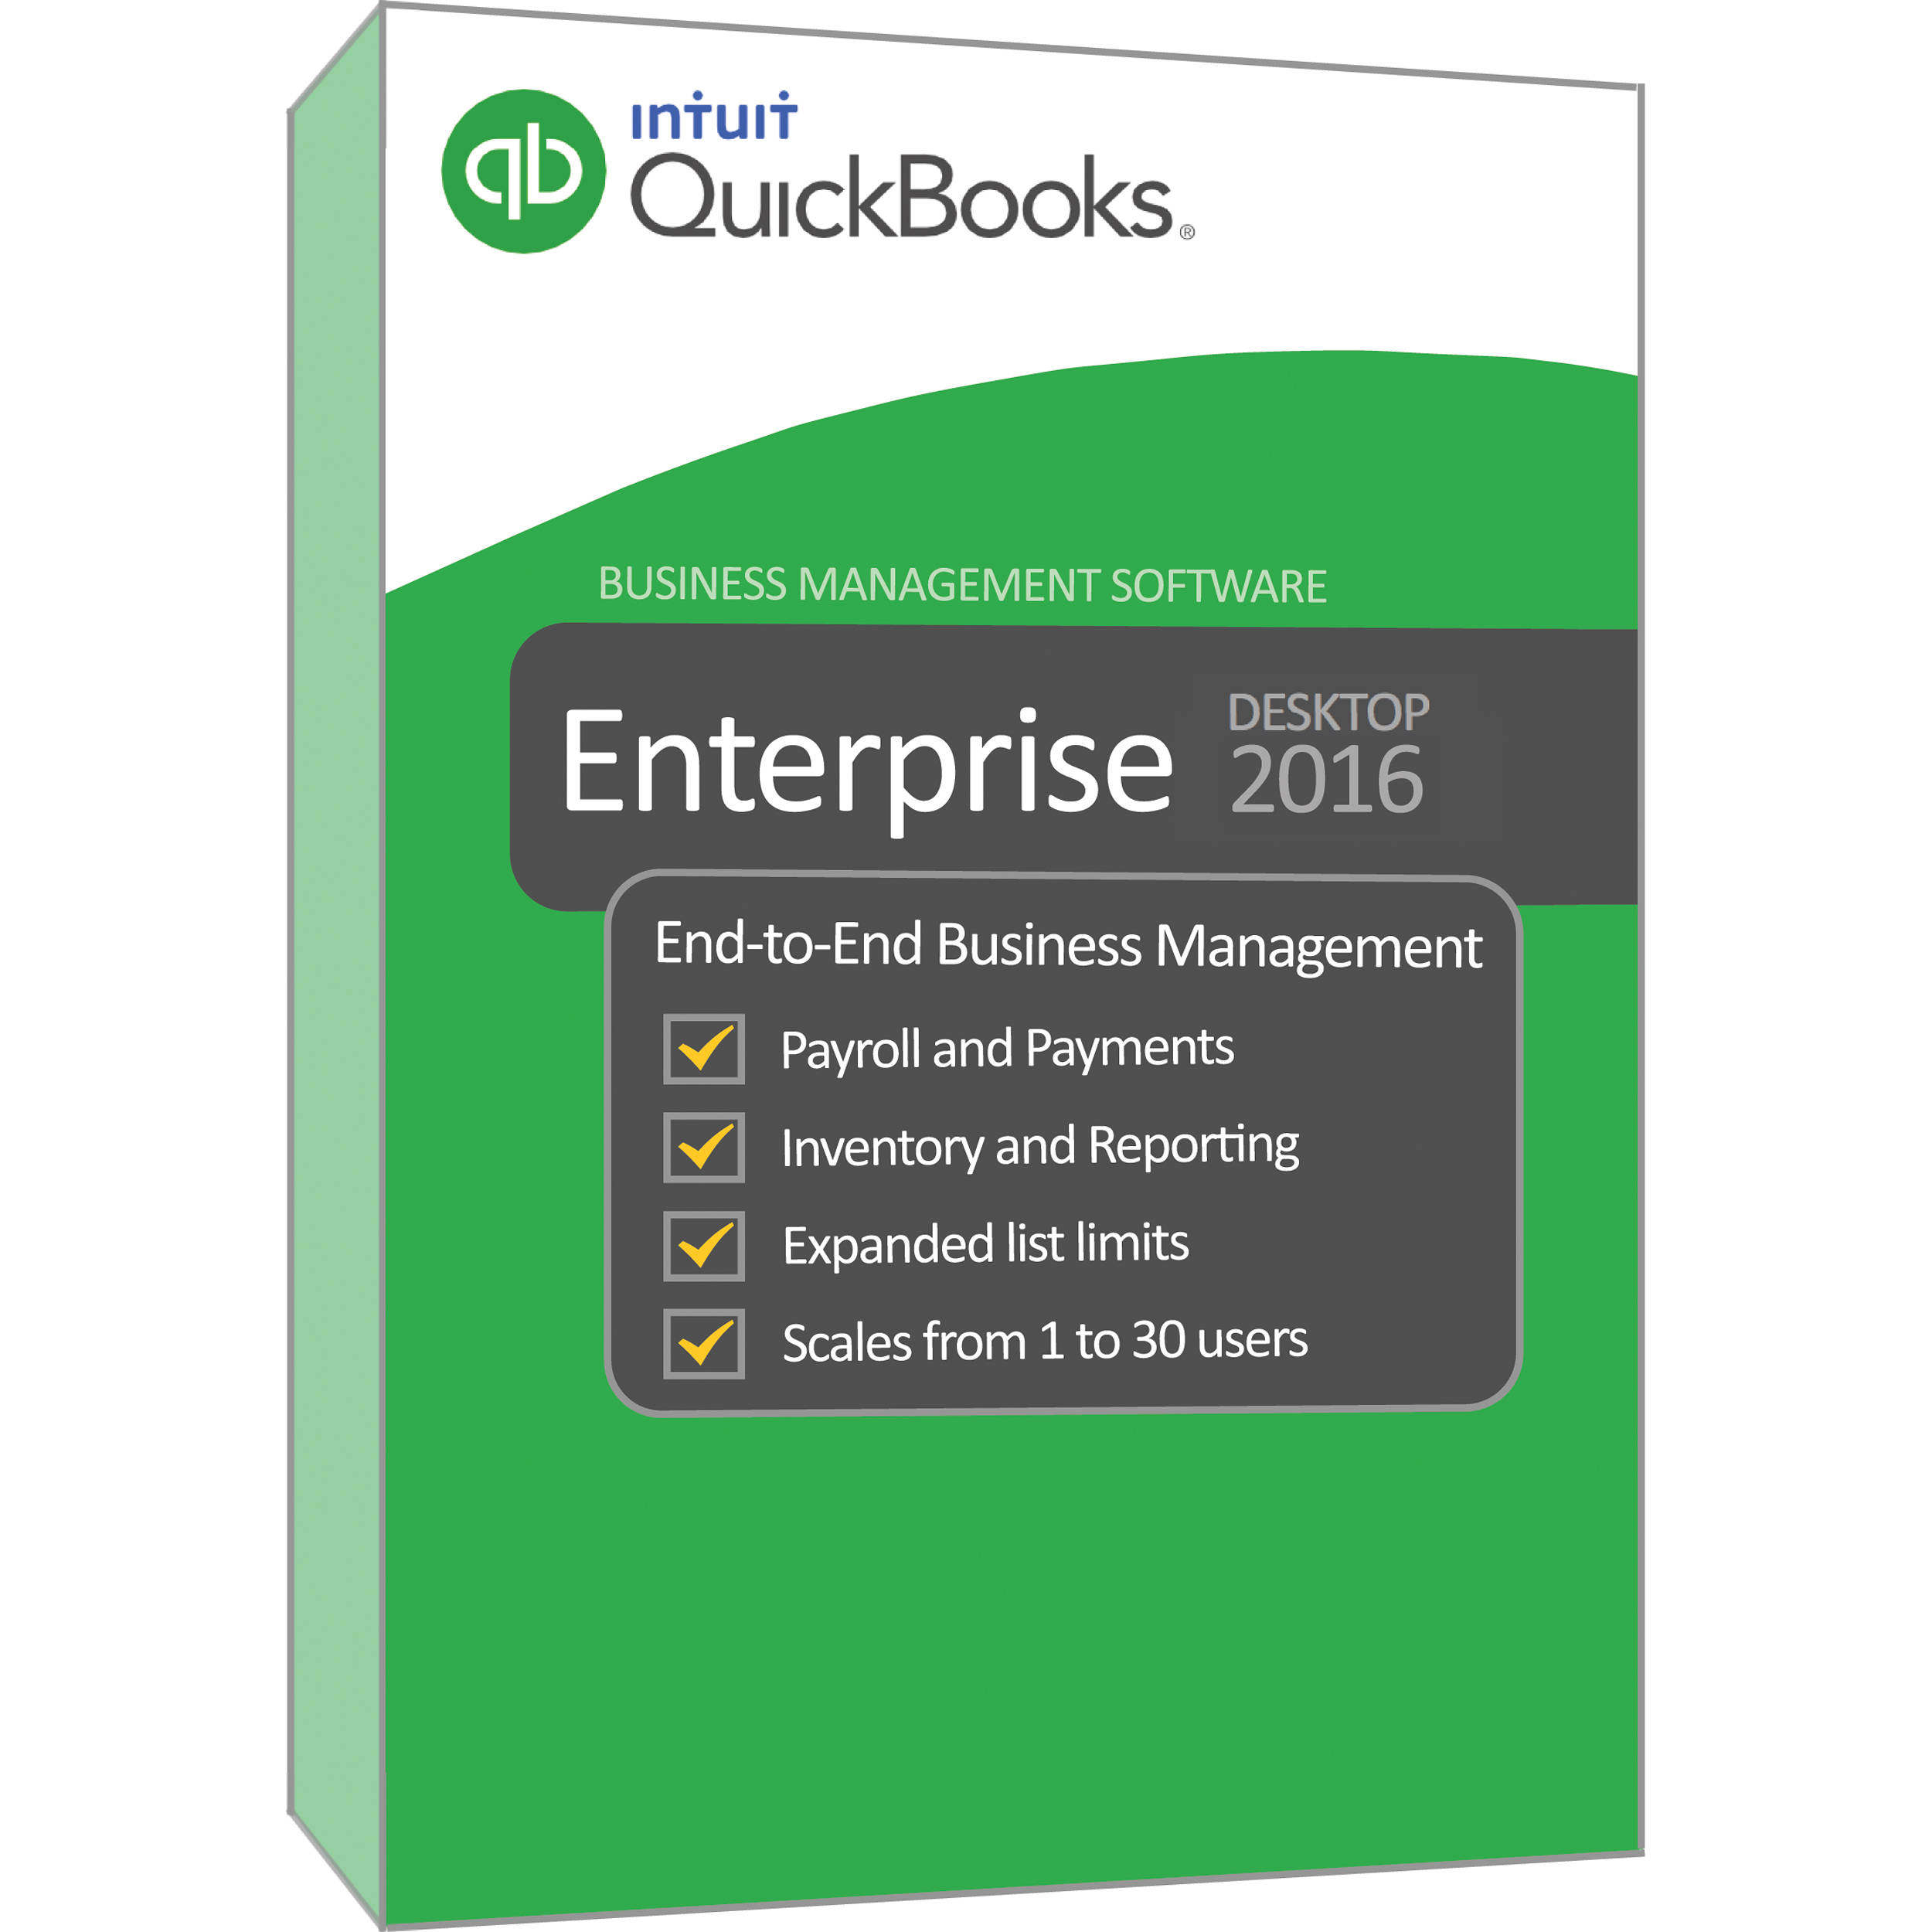 Intuit QuickBooks 2016 Enterprise Solution Platinum (Download, 1-Year  Subscription, 5-Users)